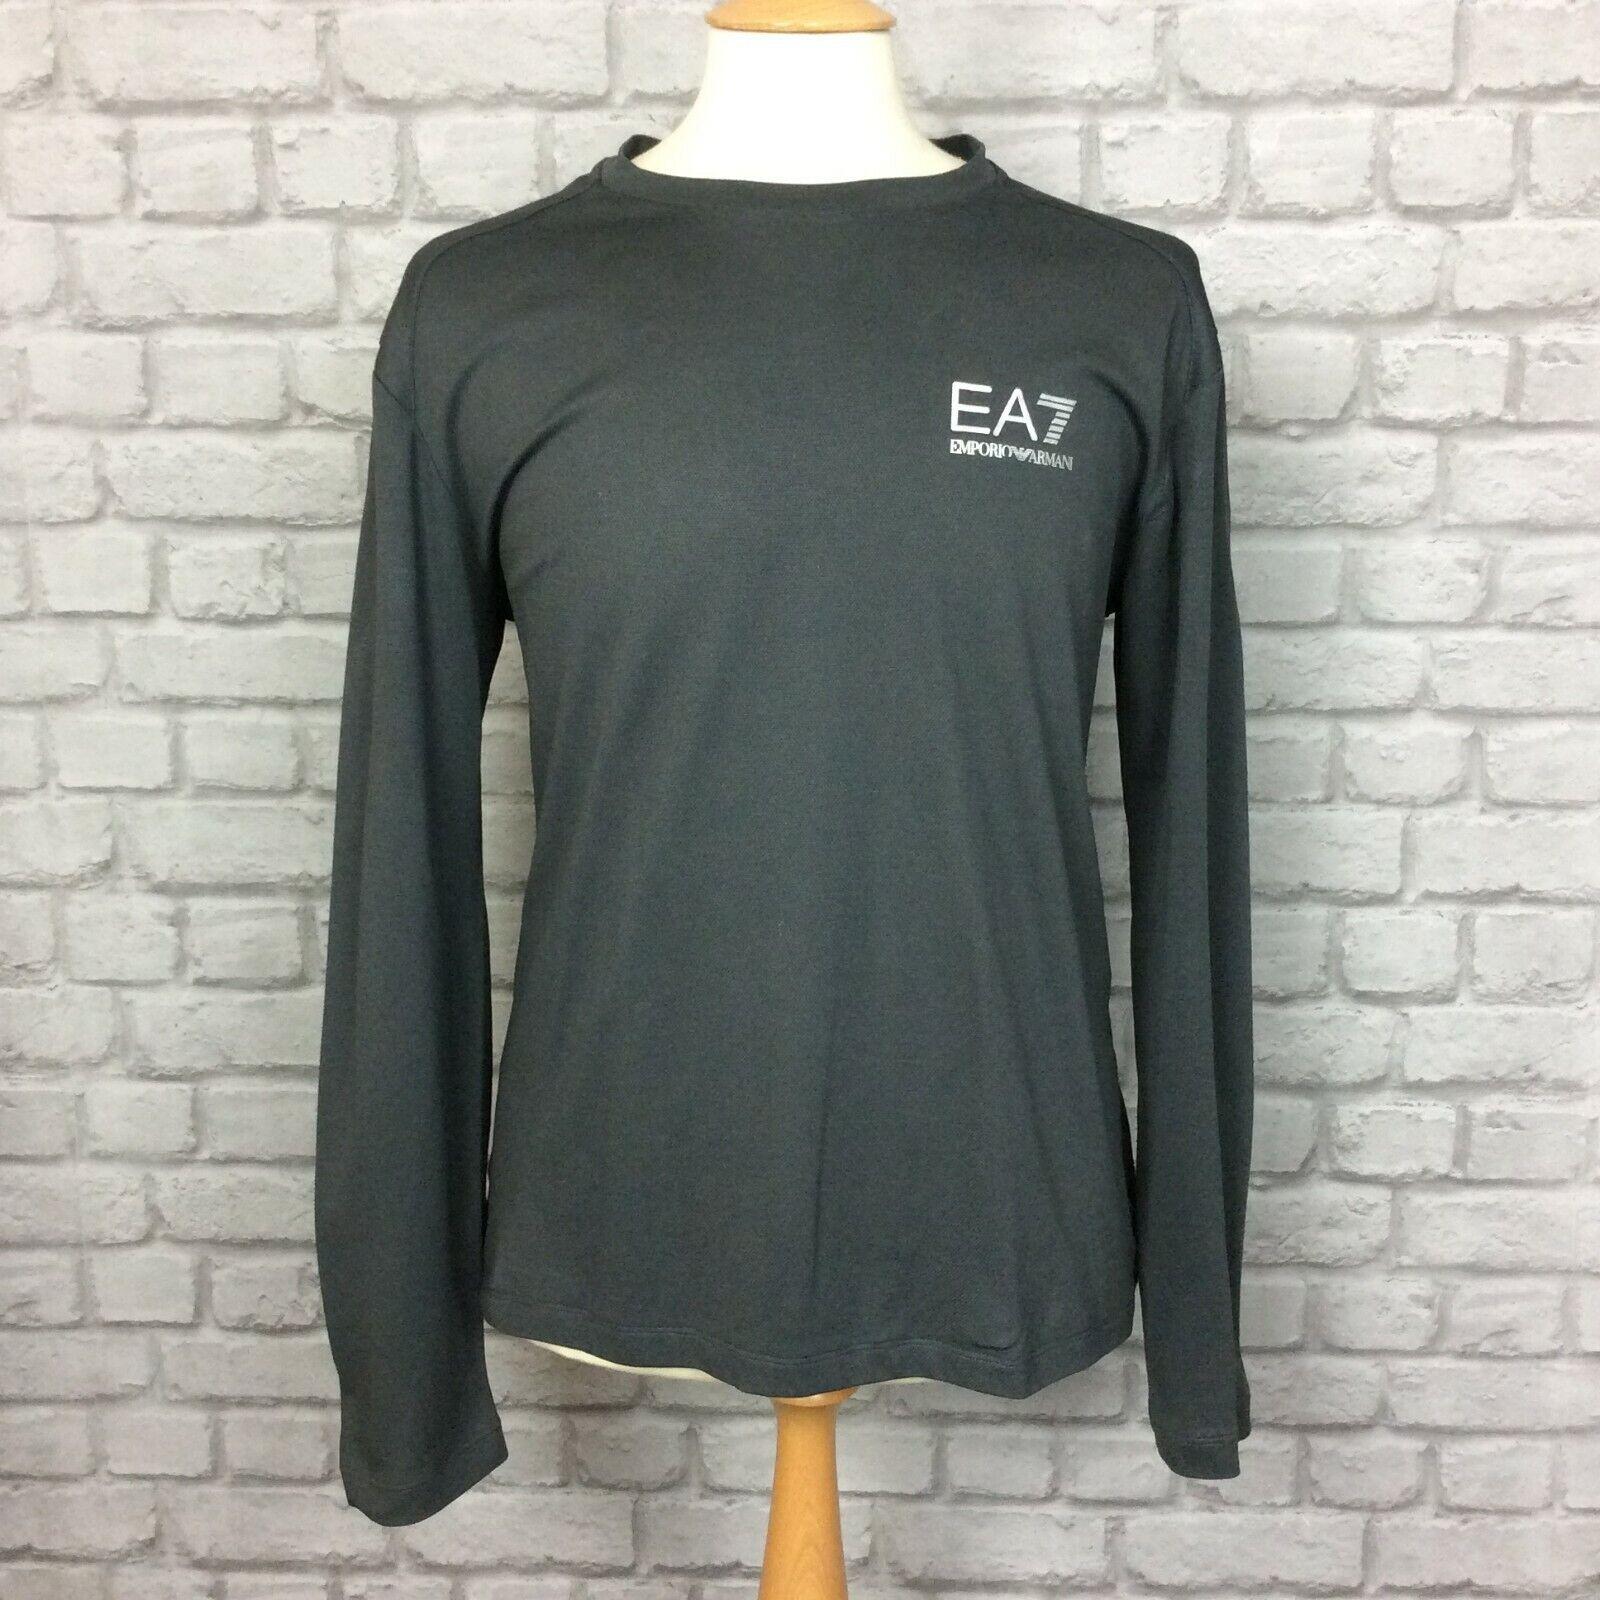 EA7 EMPORIO ARMANI DA UOMO UK XXL Grigio Manica Lunga Poly Maglietta T-shirt tee tshirt